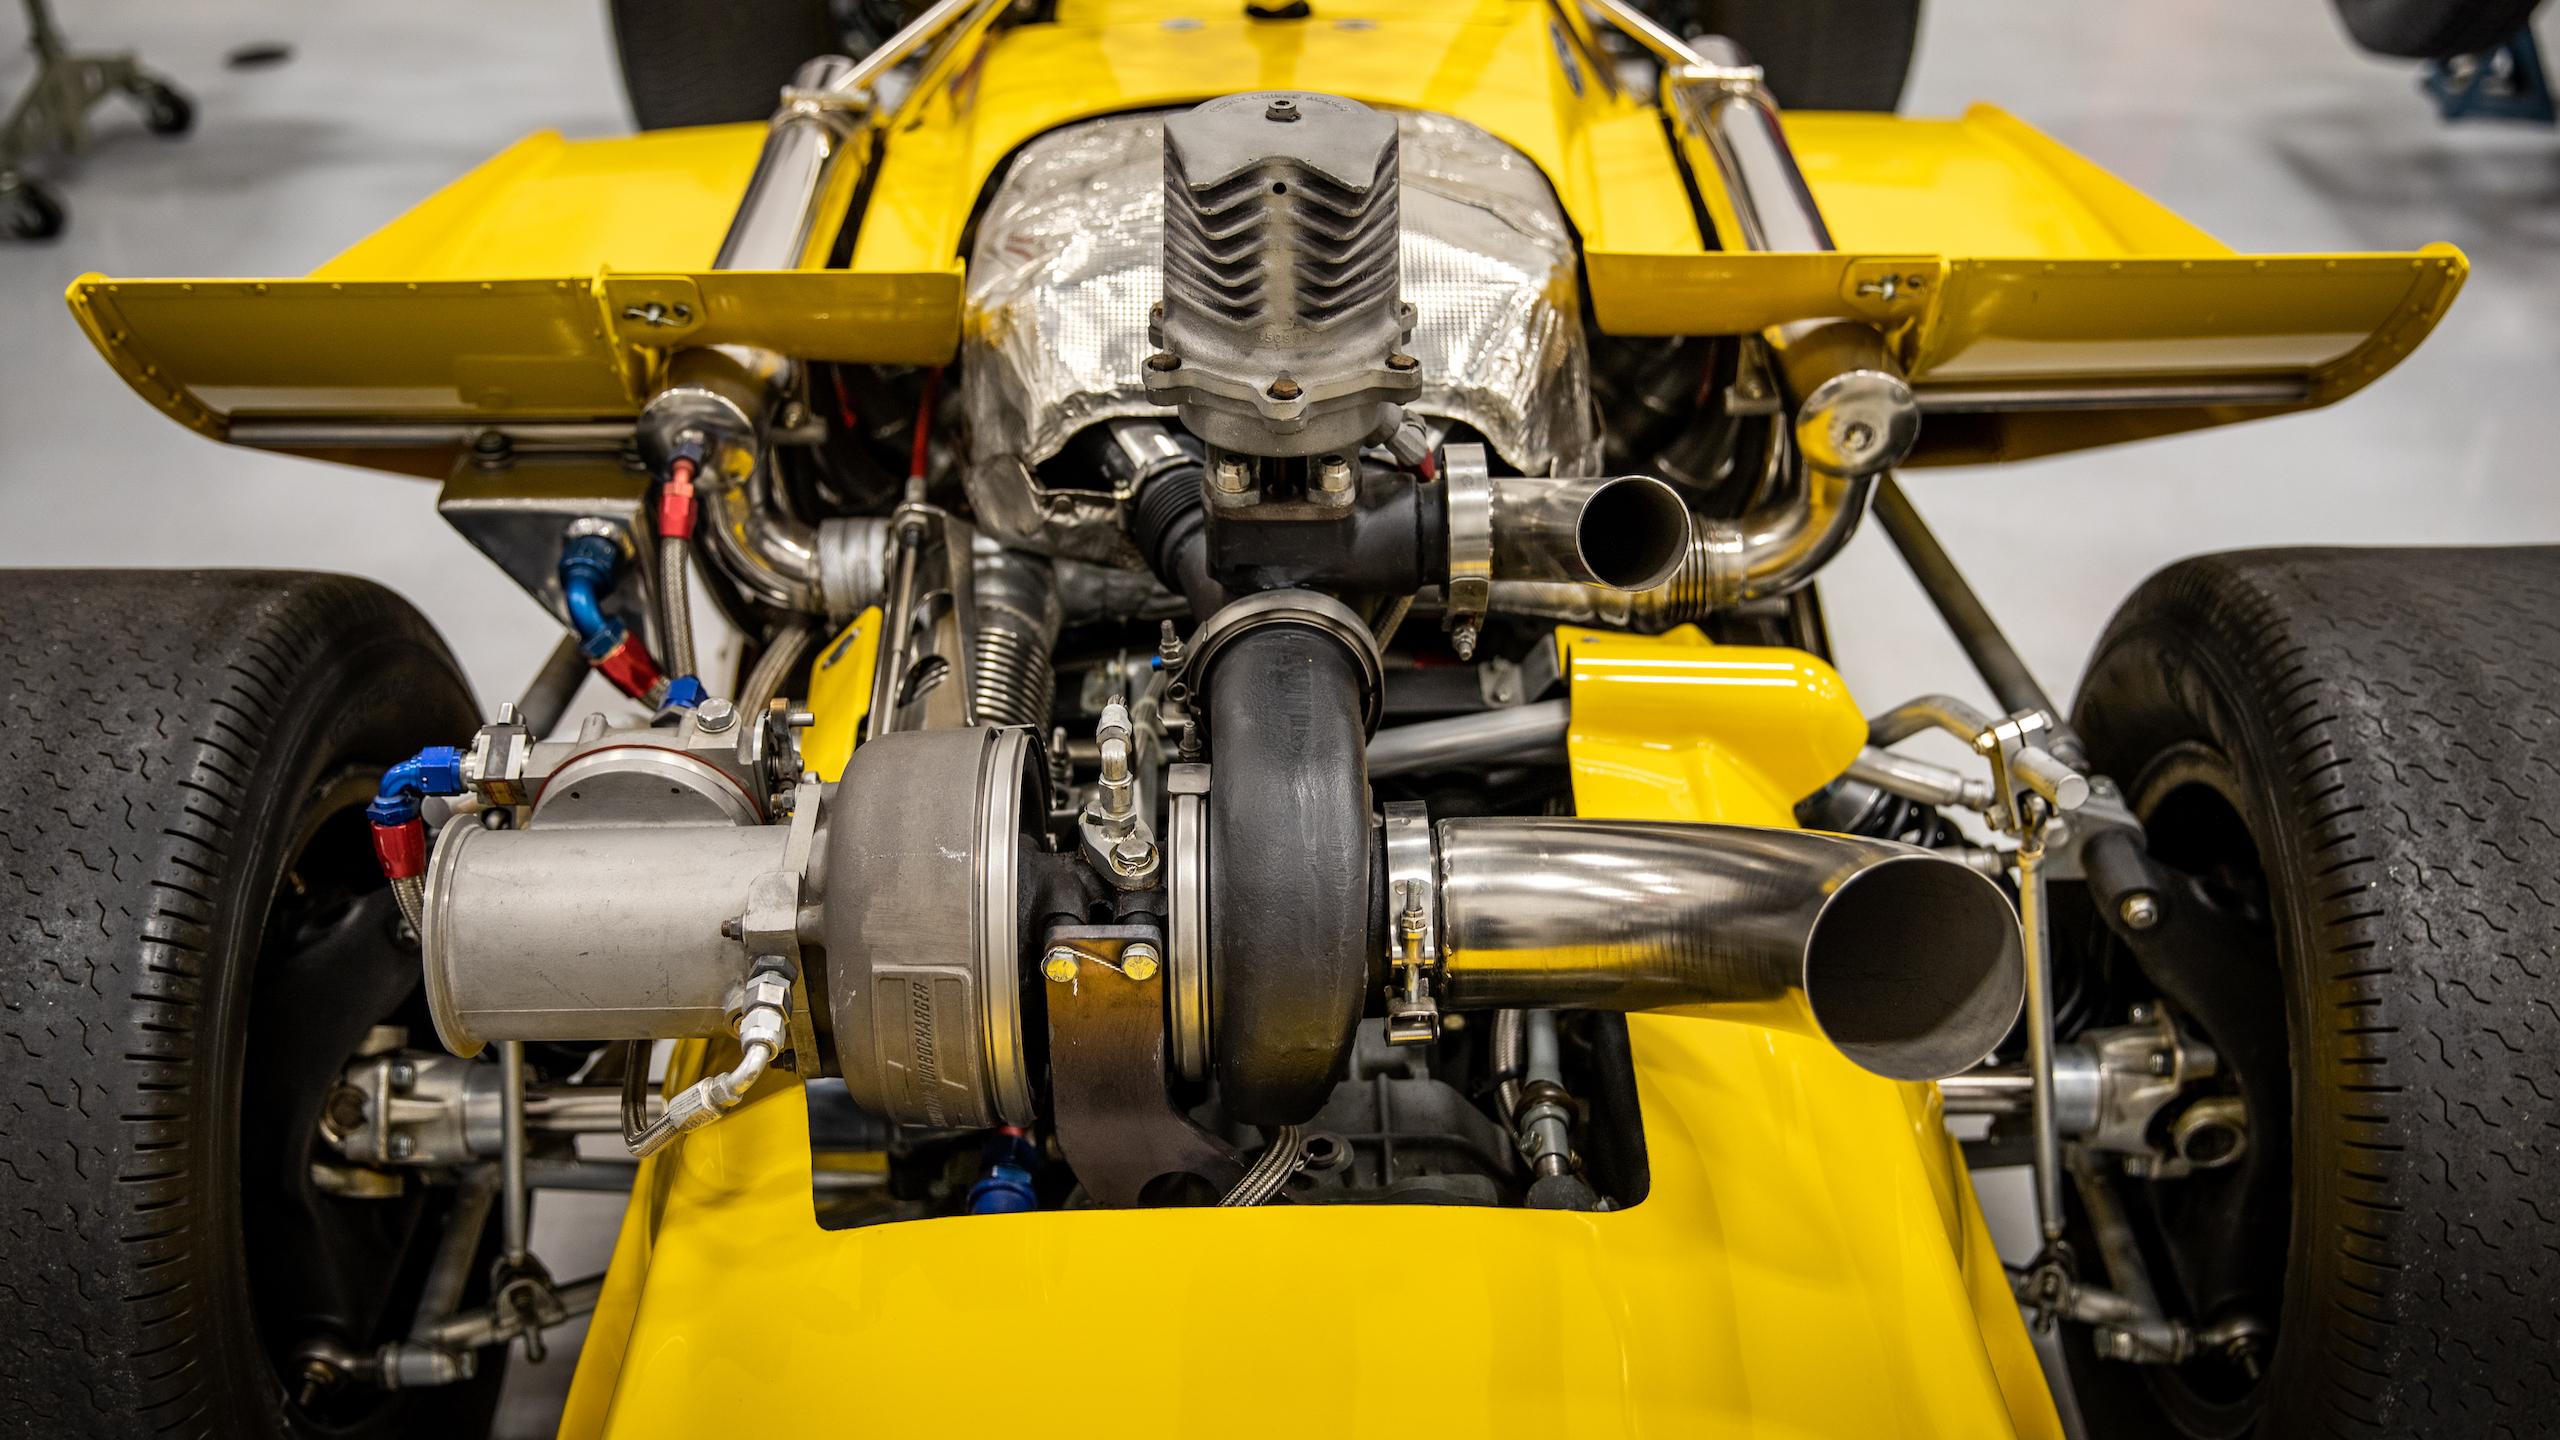 Turn 4 Restorations yellow racer engine